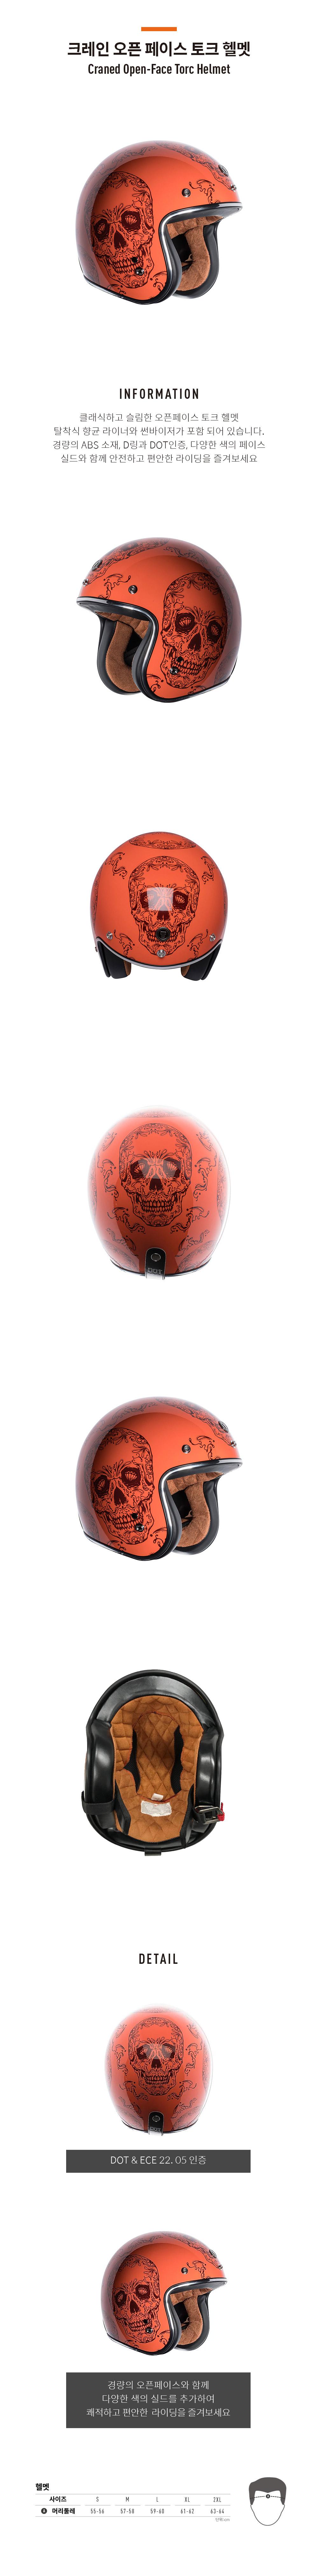 Torc 크레인 오픈페이스 토크 헬멧